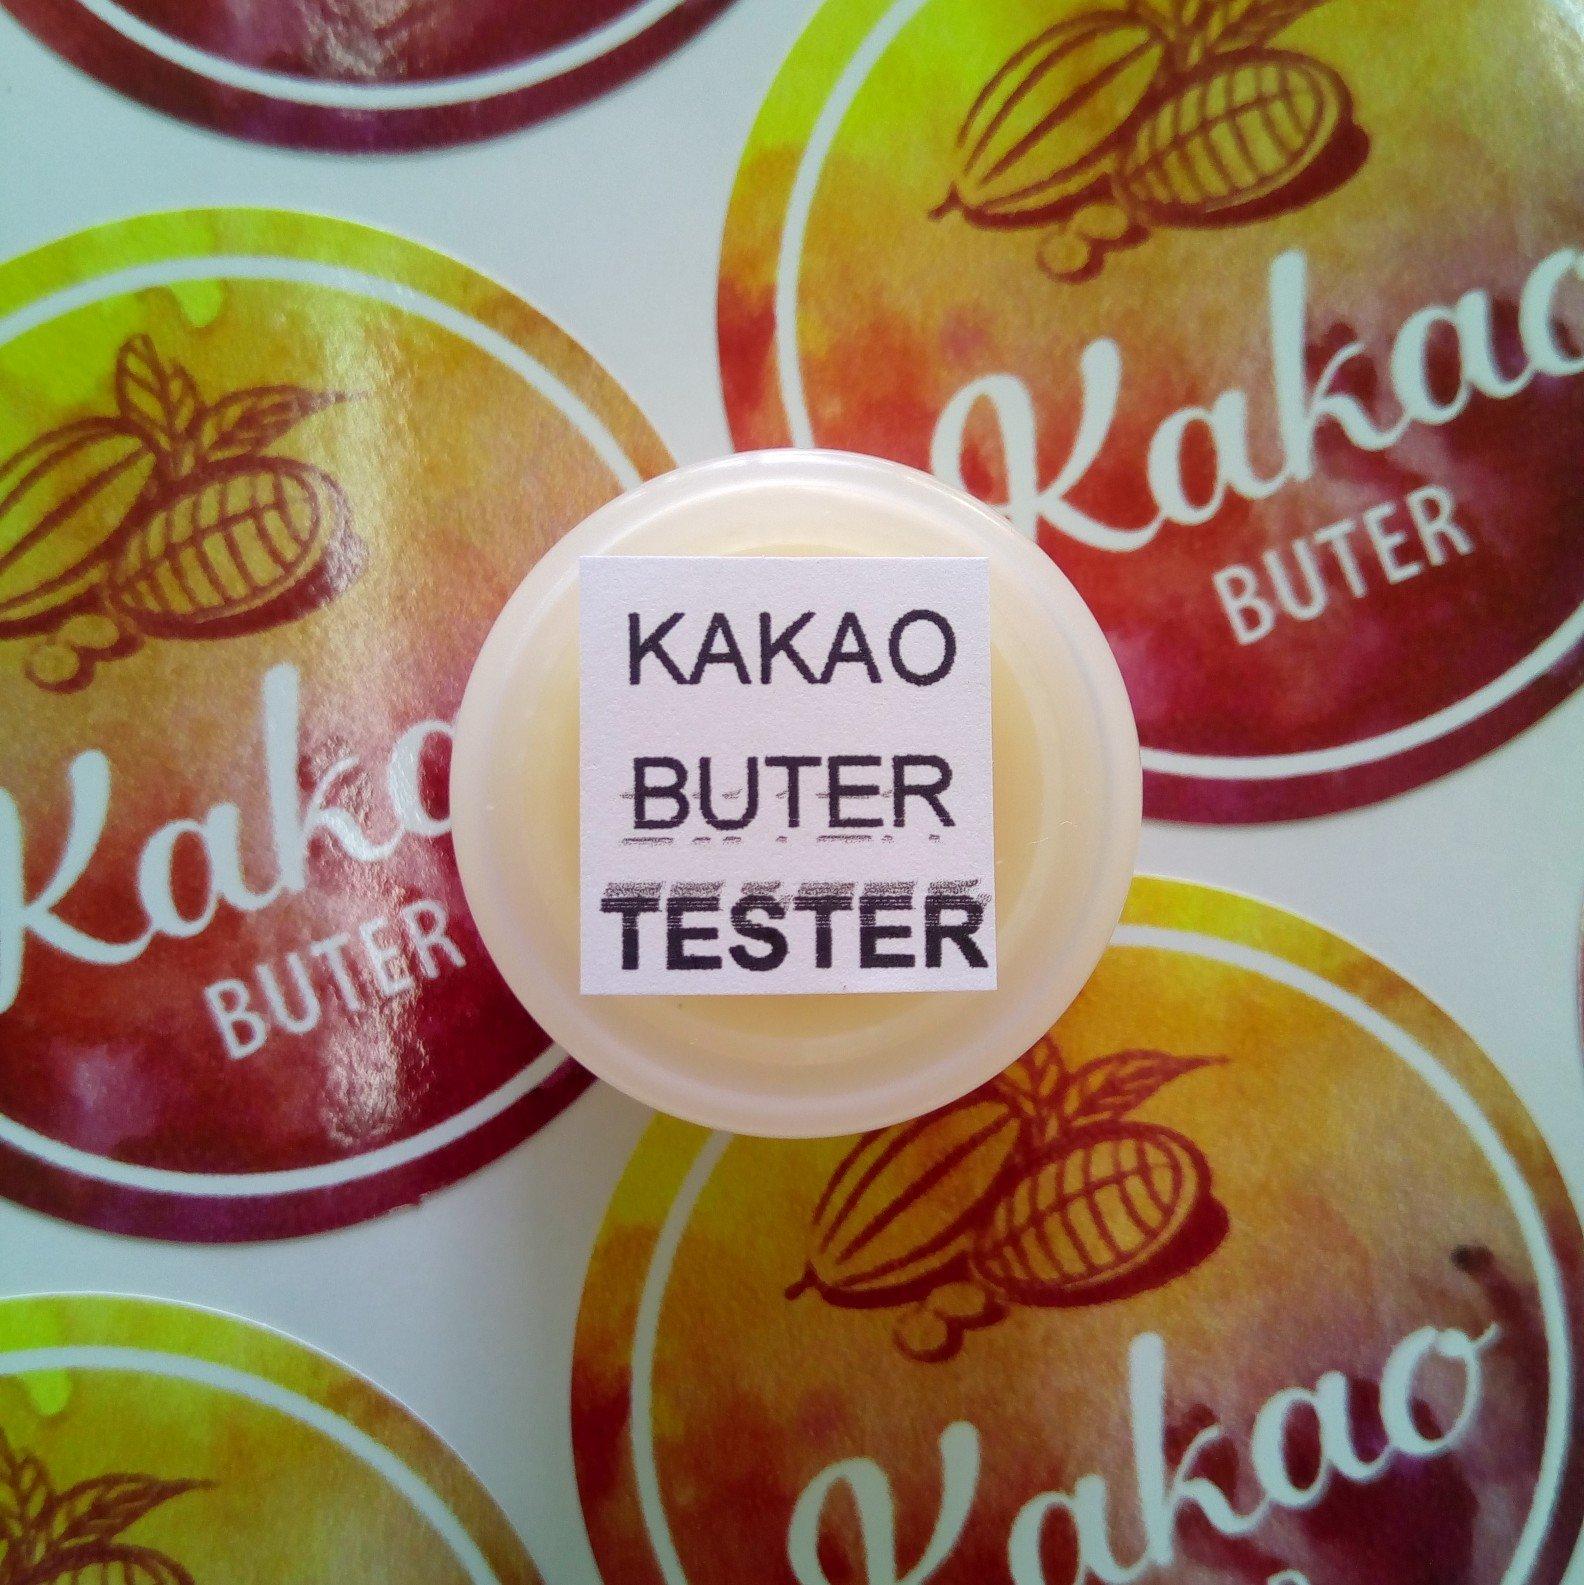 Herbateria - Tester kakao buter 5 ml 00433